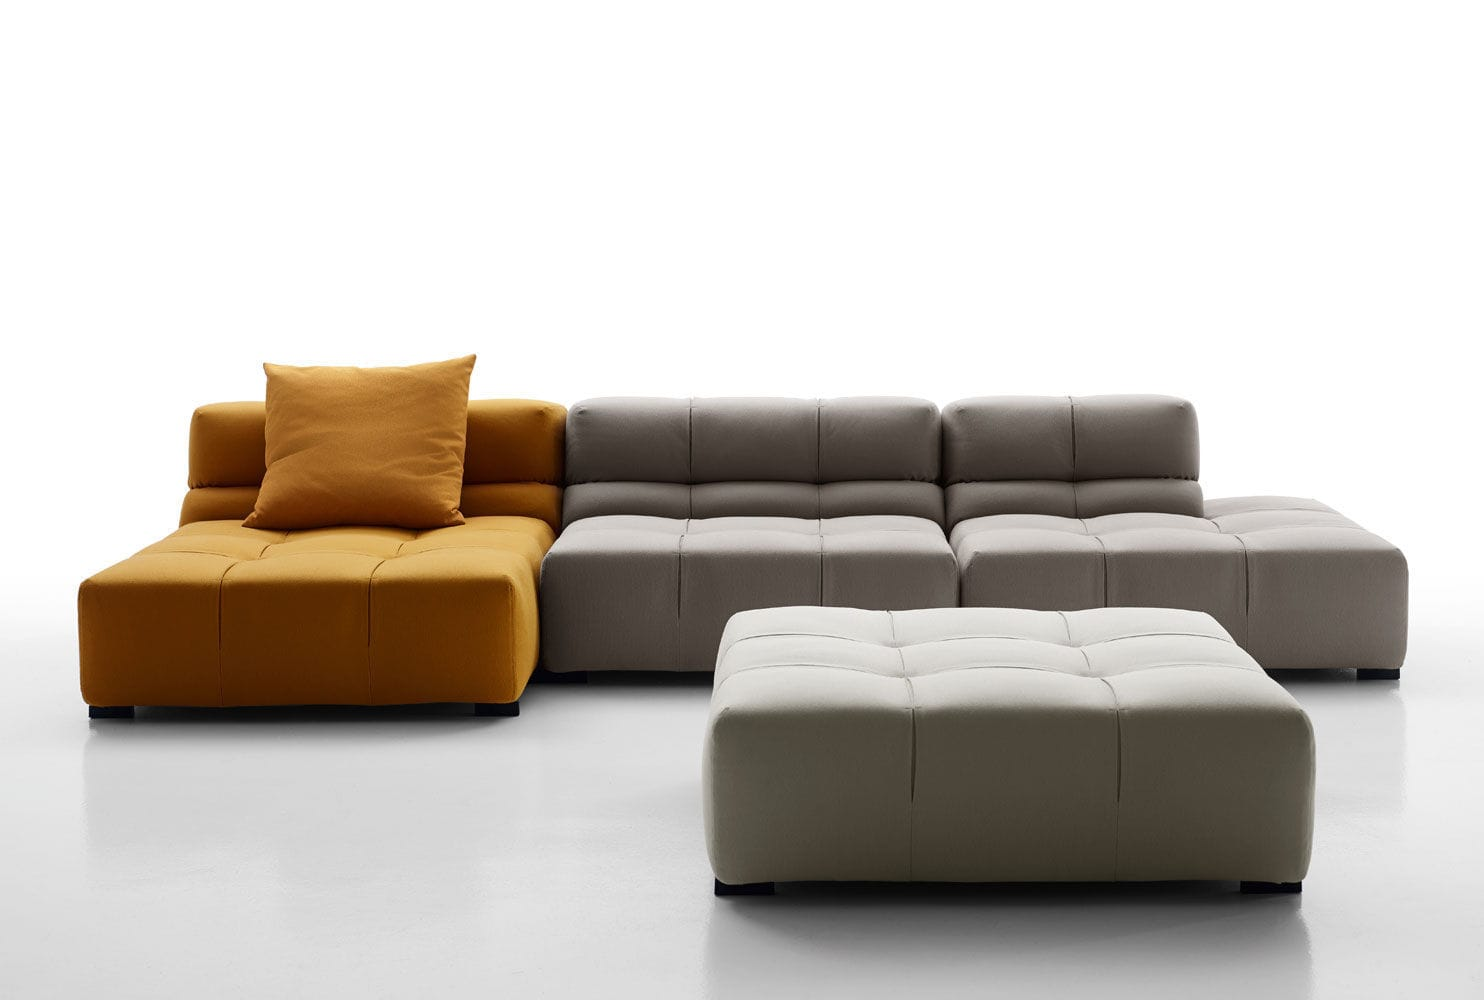 modular sofa  contemporary  leather  fabric  tuftytime '  - modular sofa  contemporary  leather  fabric  tuftytime '